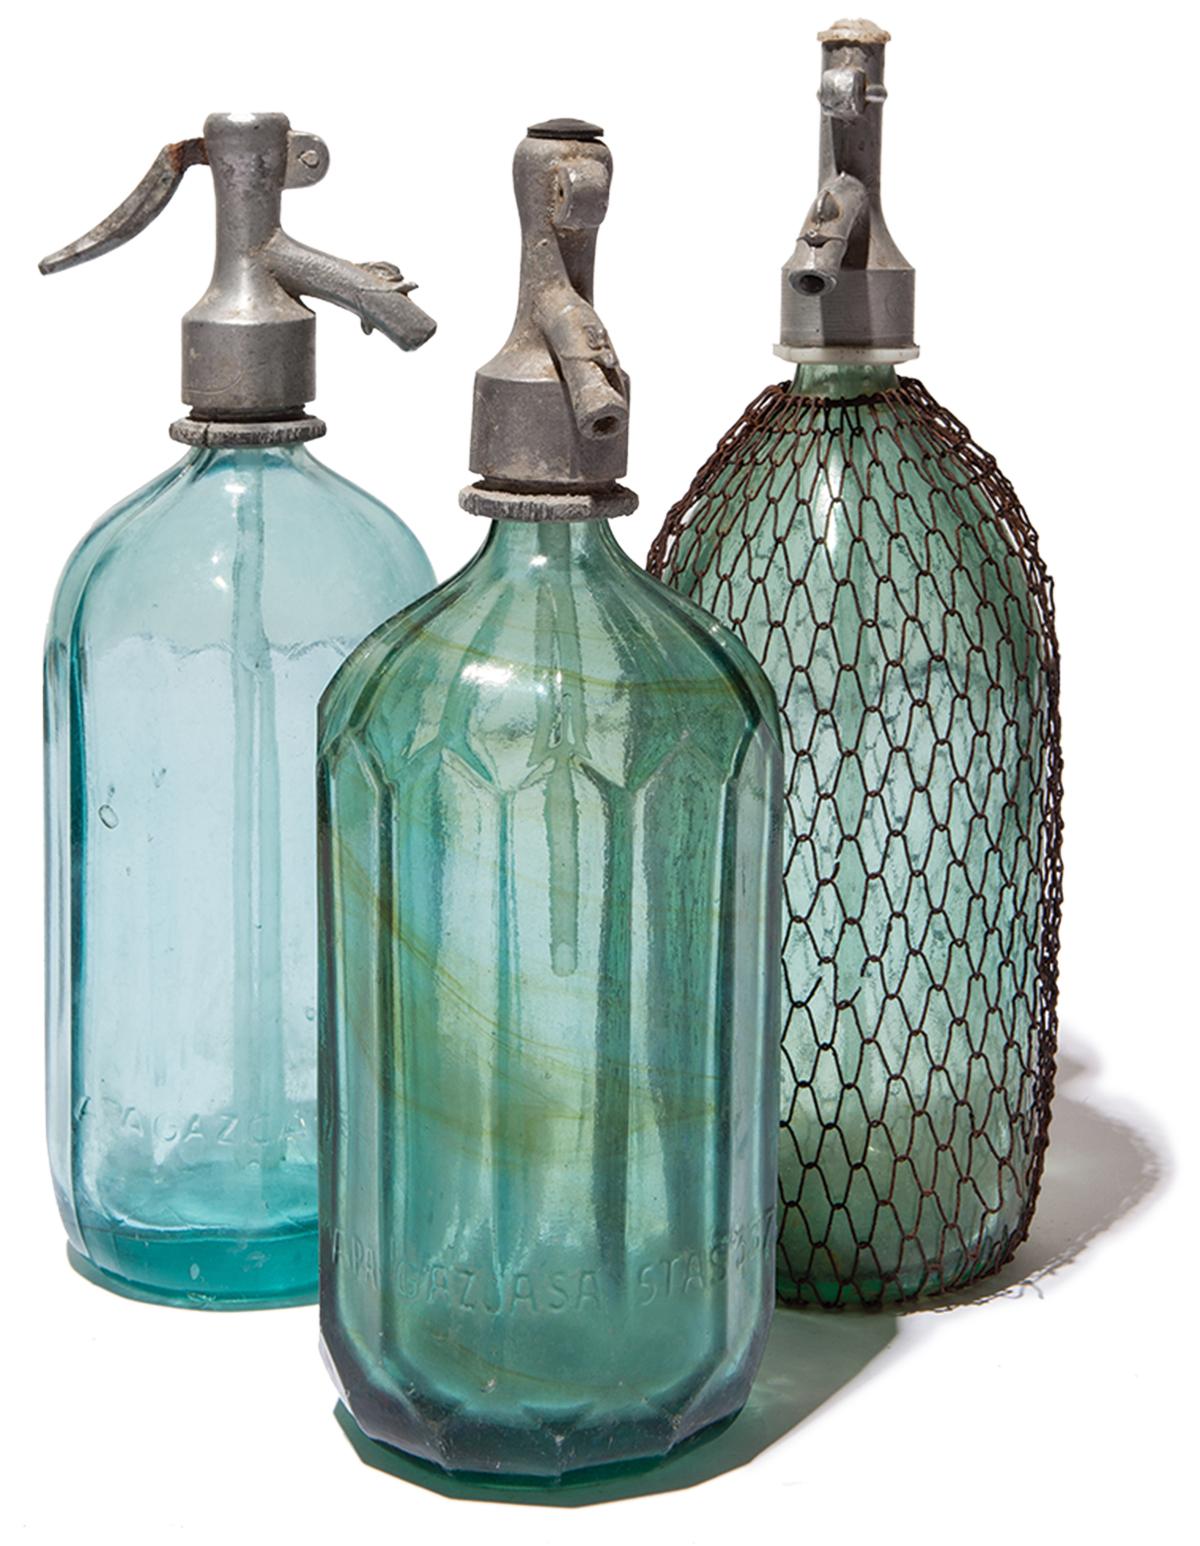 Vintage seltzer bottles from Europe, $55